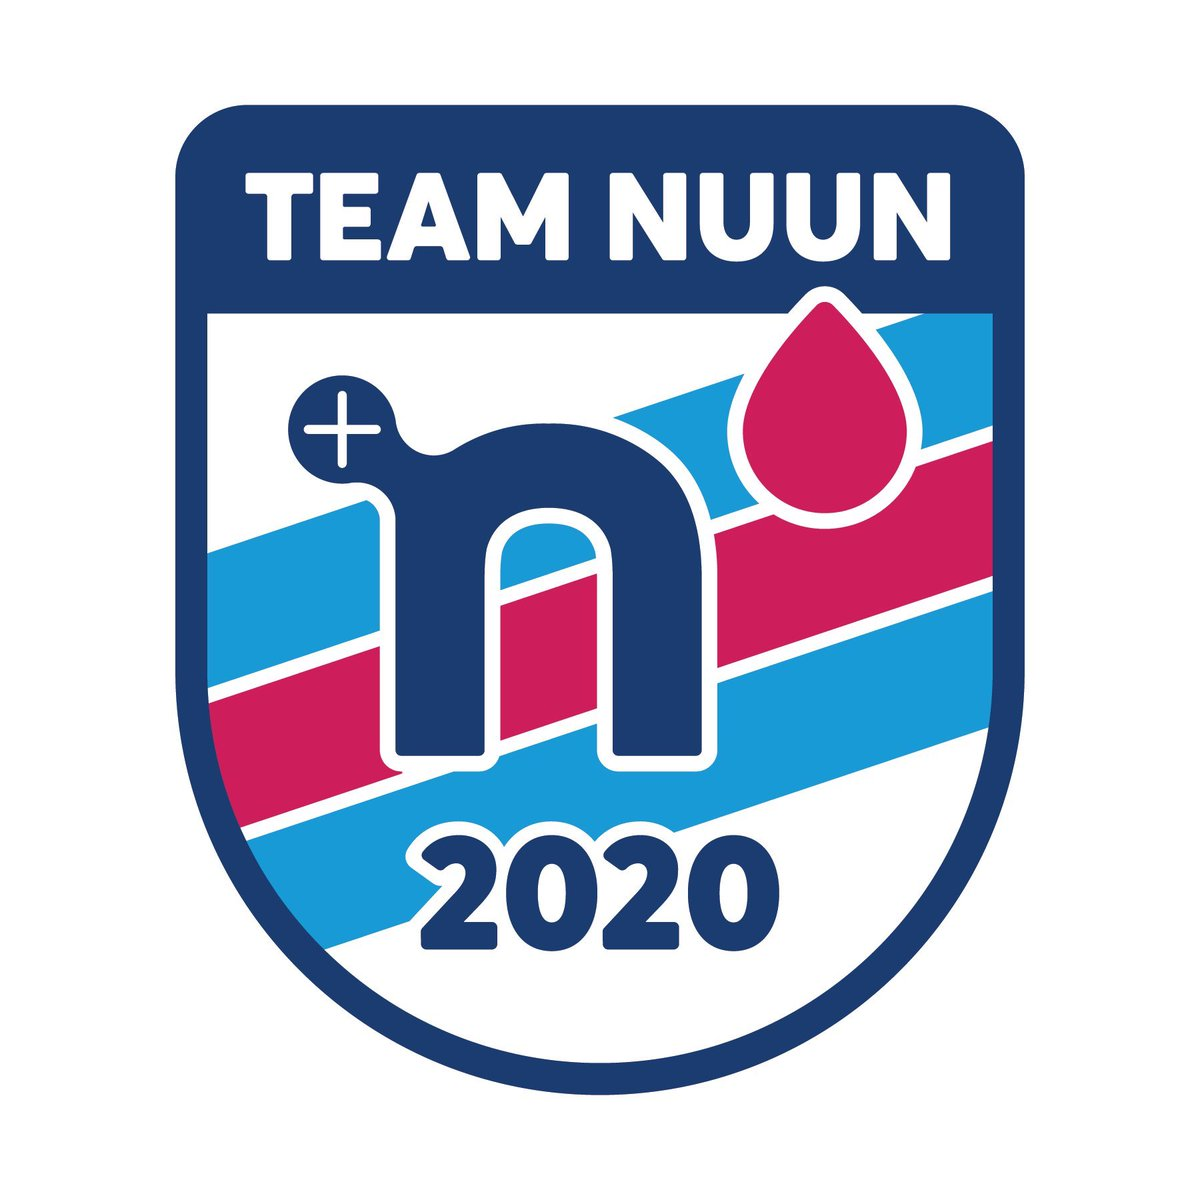 2nd year as a @nuunhydration ambassador  #nuunbassador2020 #nuunlove #makeyourwatercount #electrolytesarelife<br>http://pic.twitter.com/JXaTdJNNon